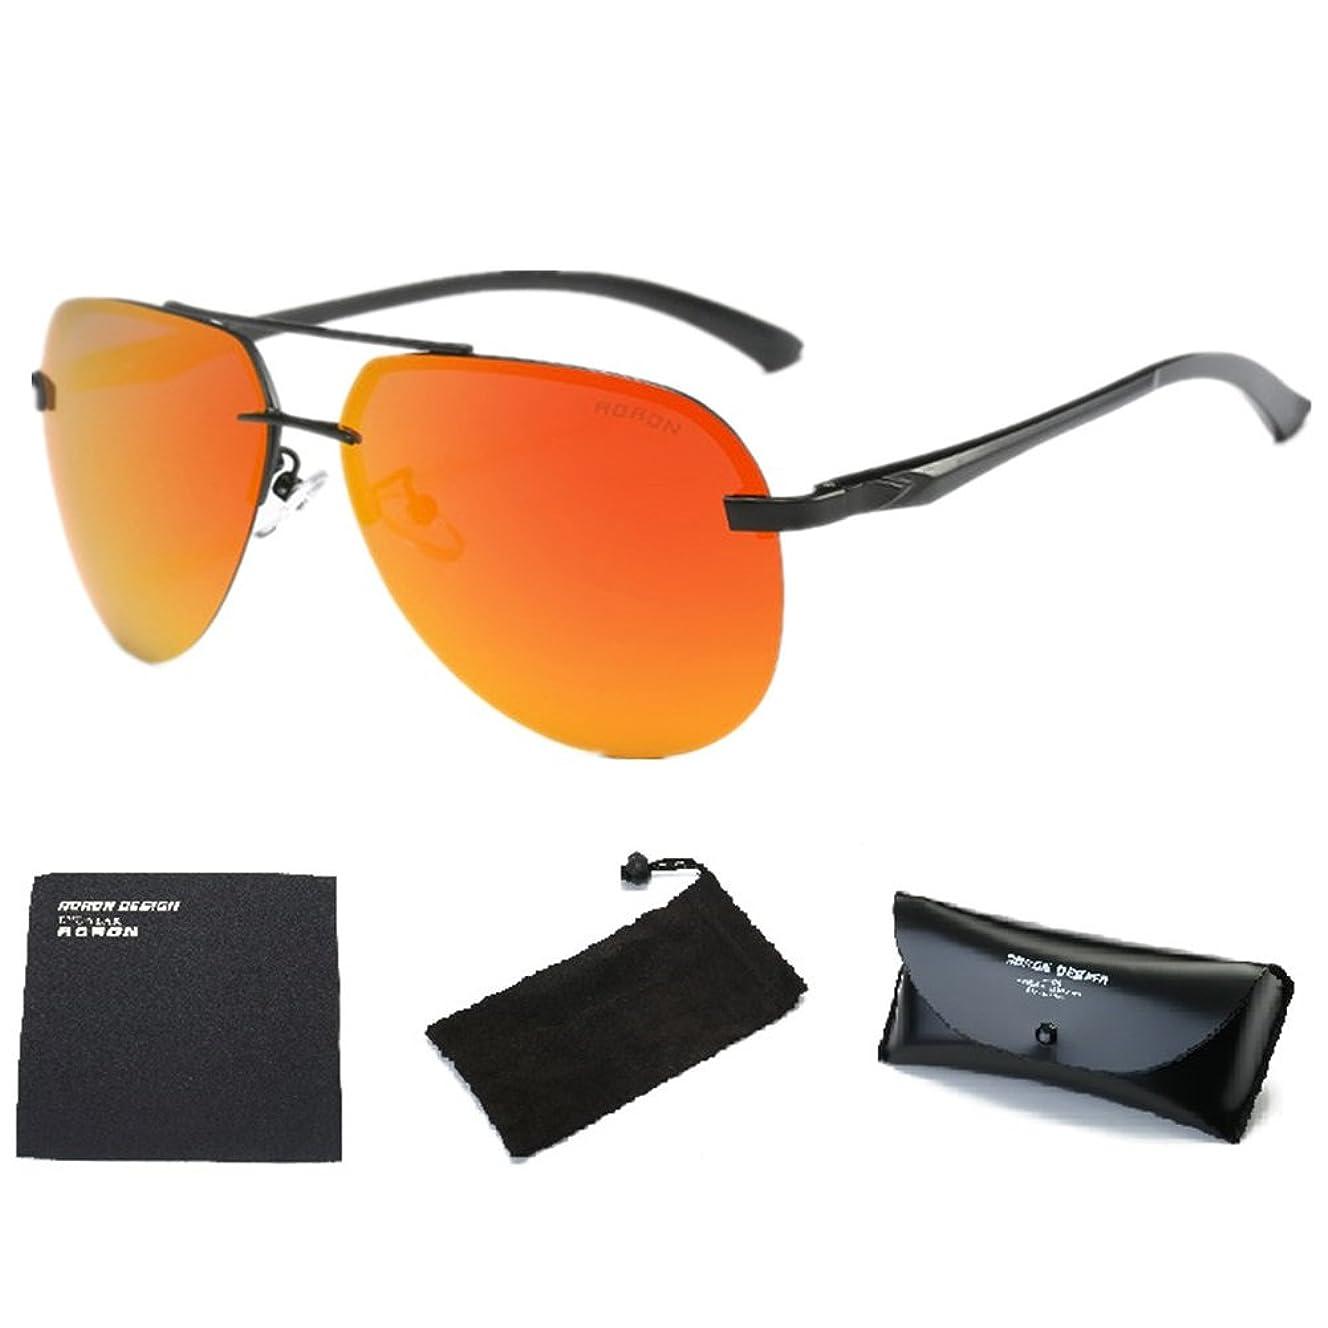 Wonzone Men's Aviator Sunglasses Polarized UV400 for Men Women with Sun Glasses Case